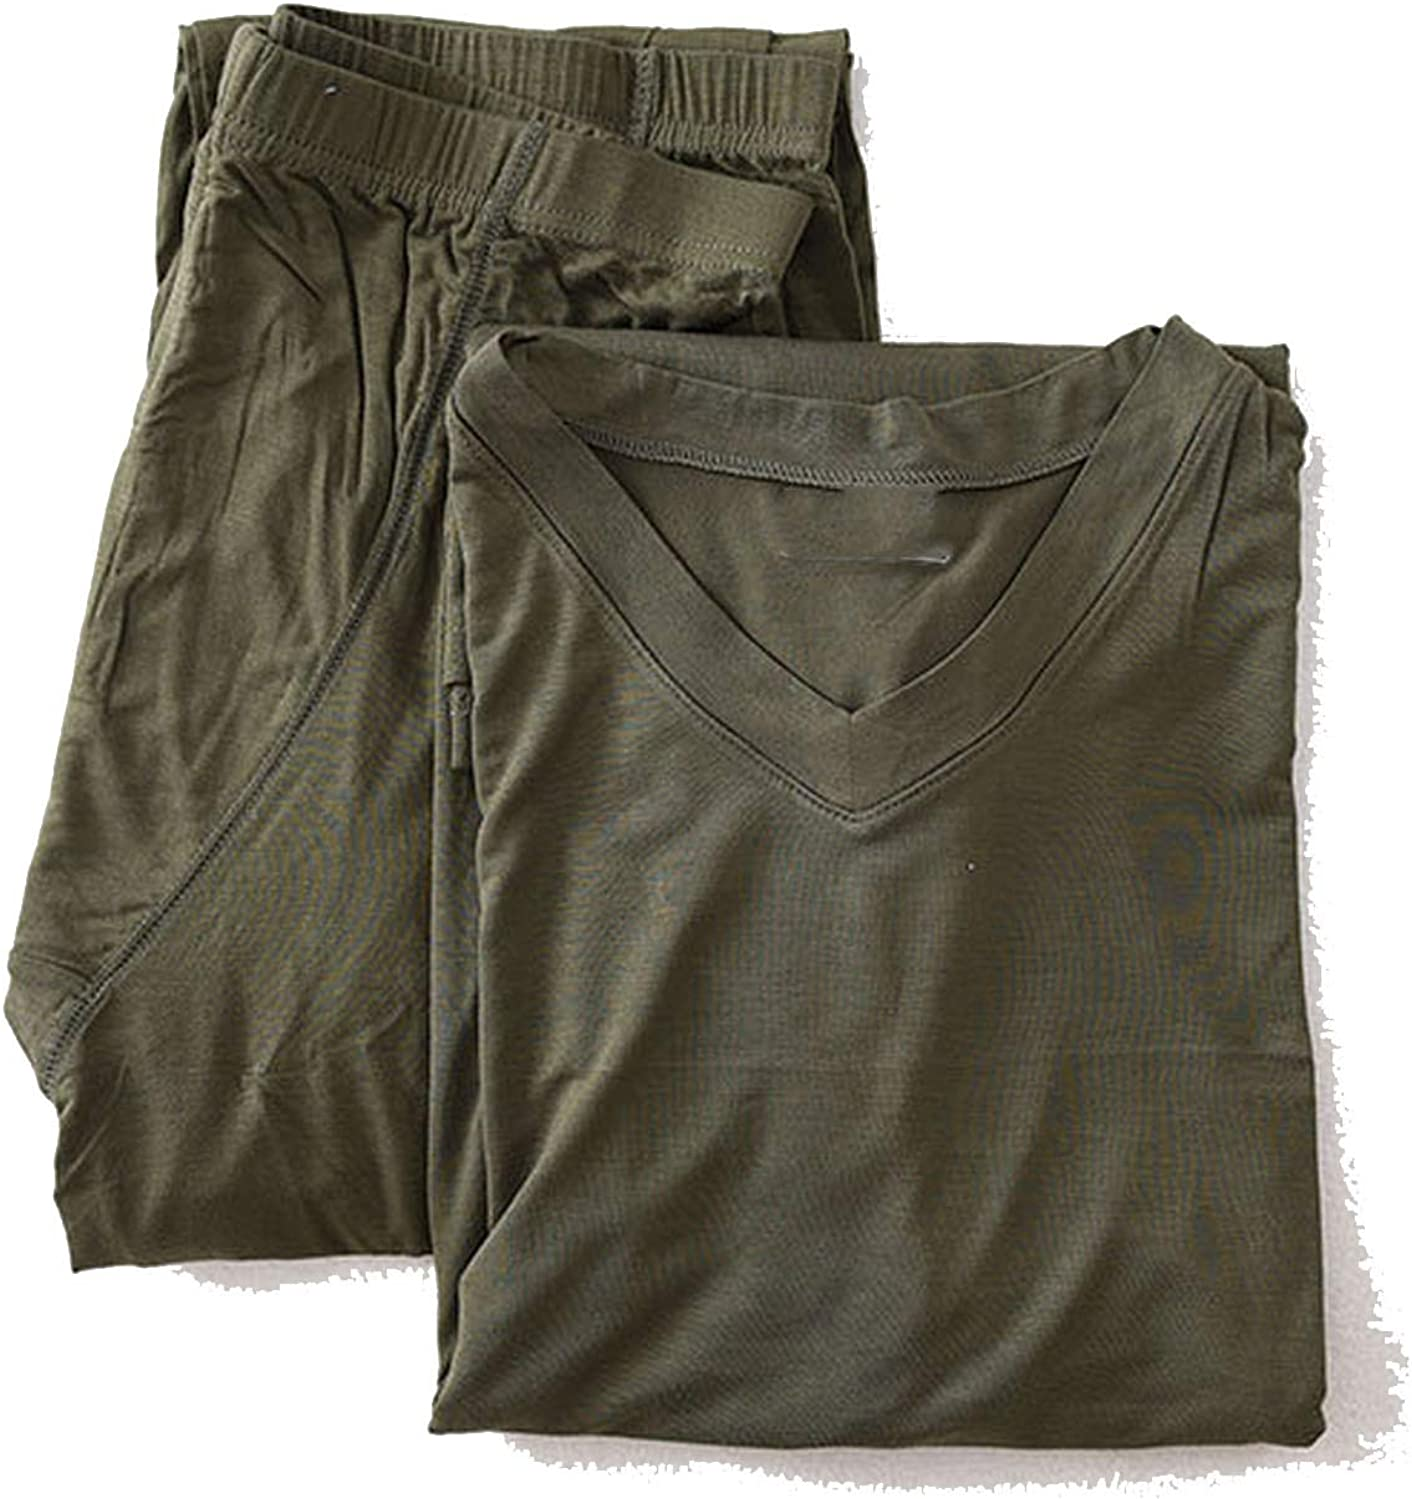 Men's Bamboo Fiber Long Sleeved Long Underwear Modal Mens Sheer Tights Thermal Underwear